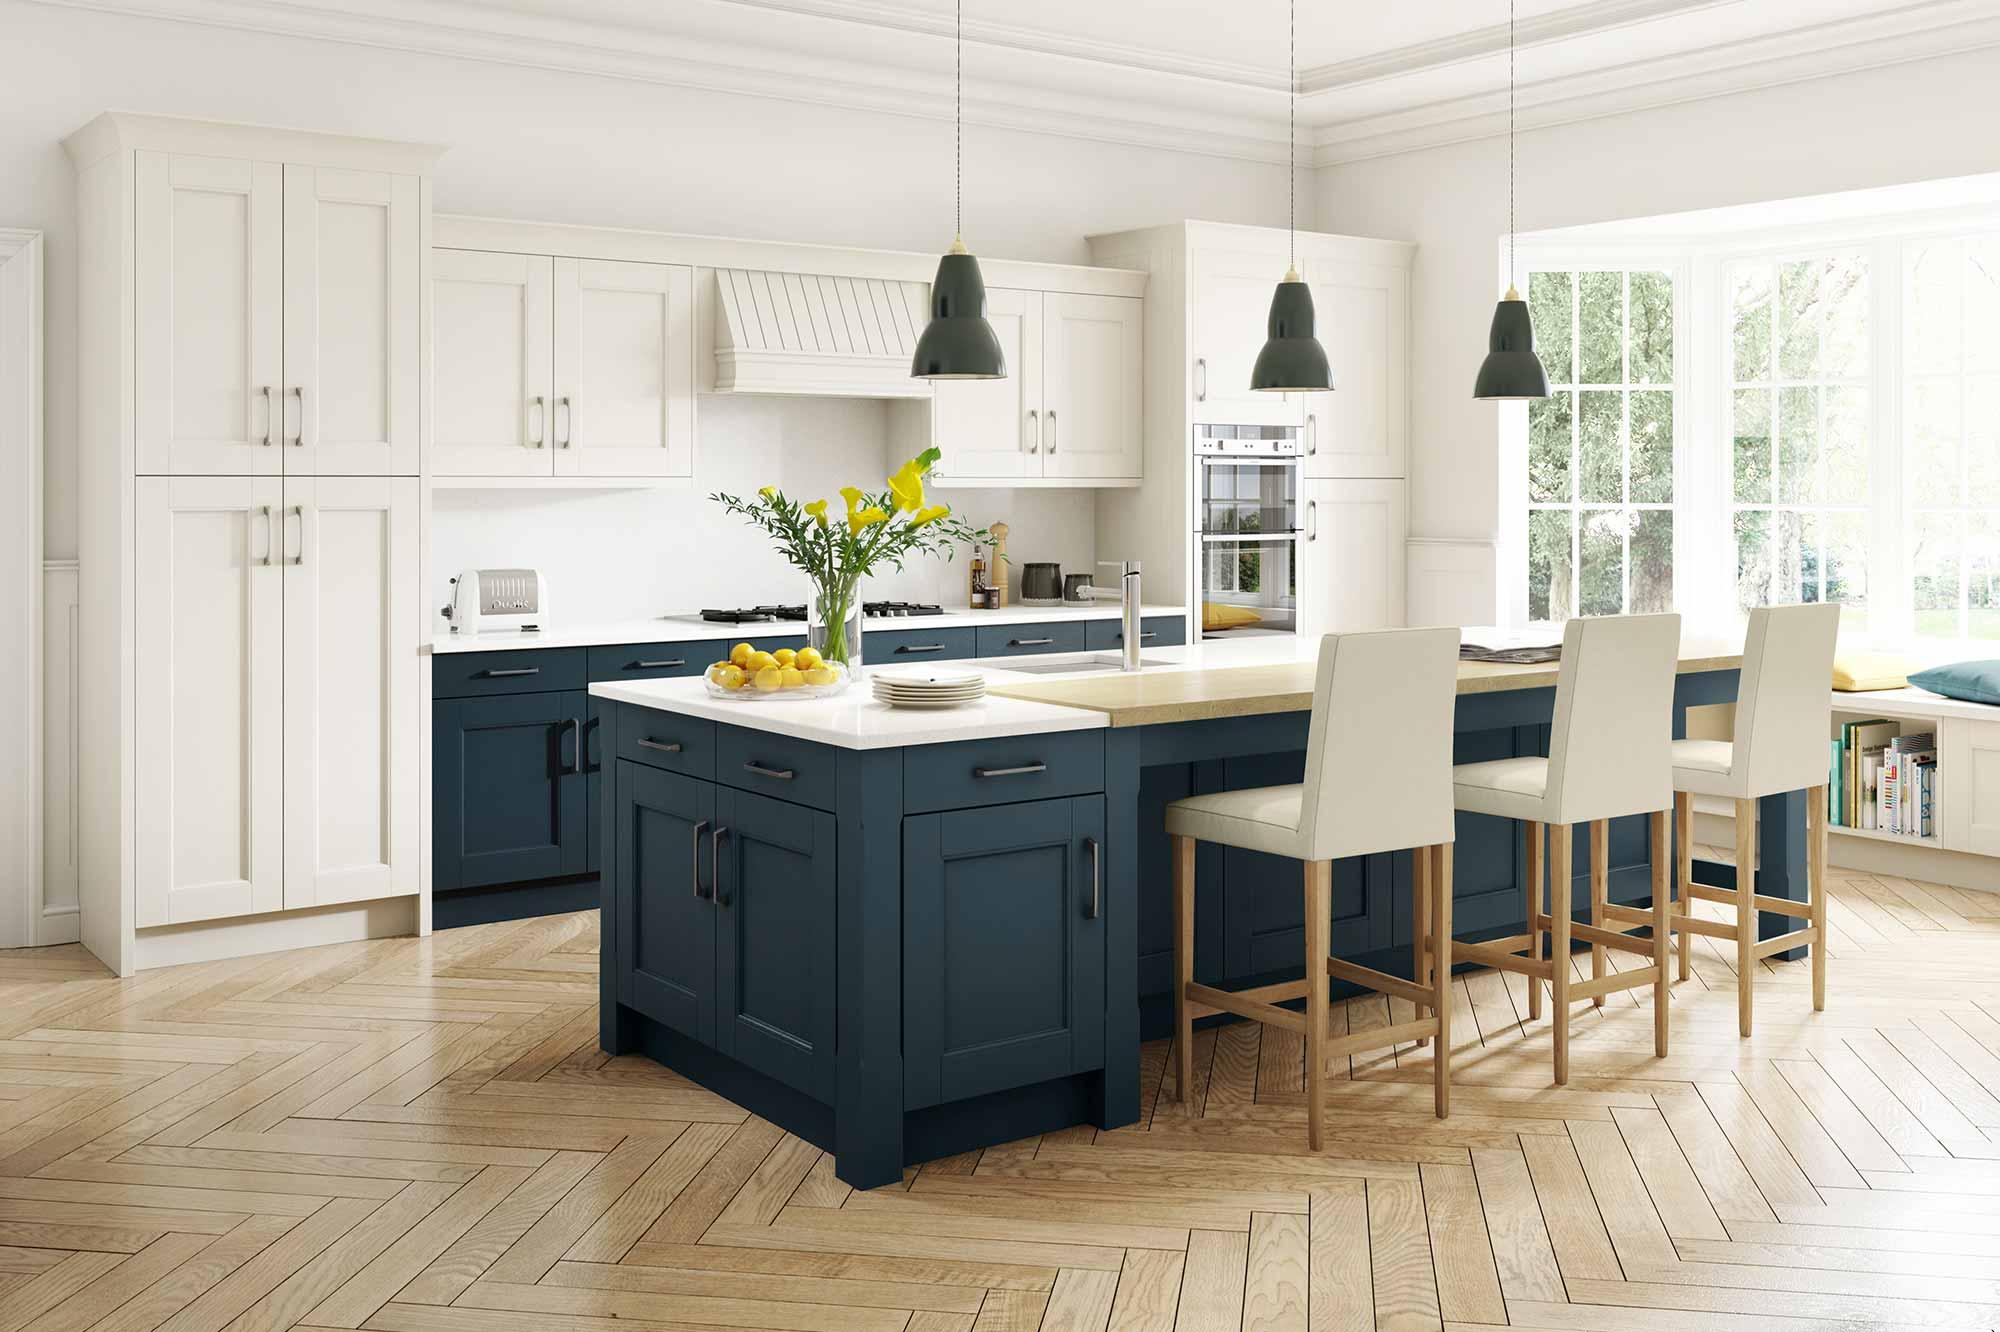 Kitchens East Kilbride 4